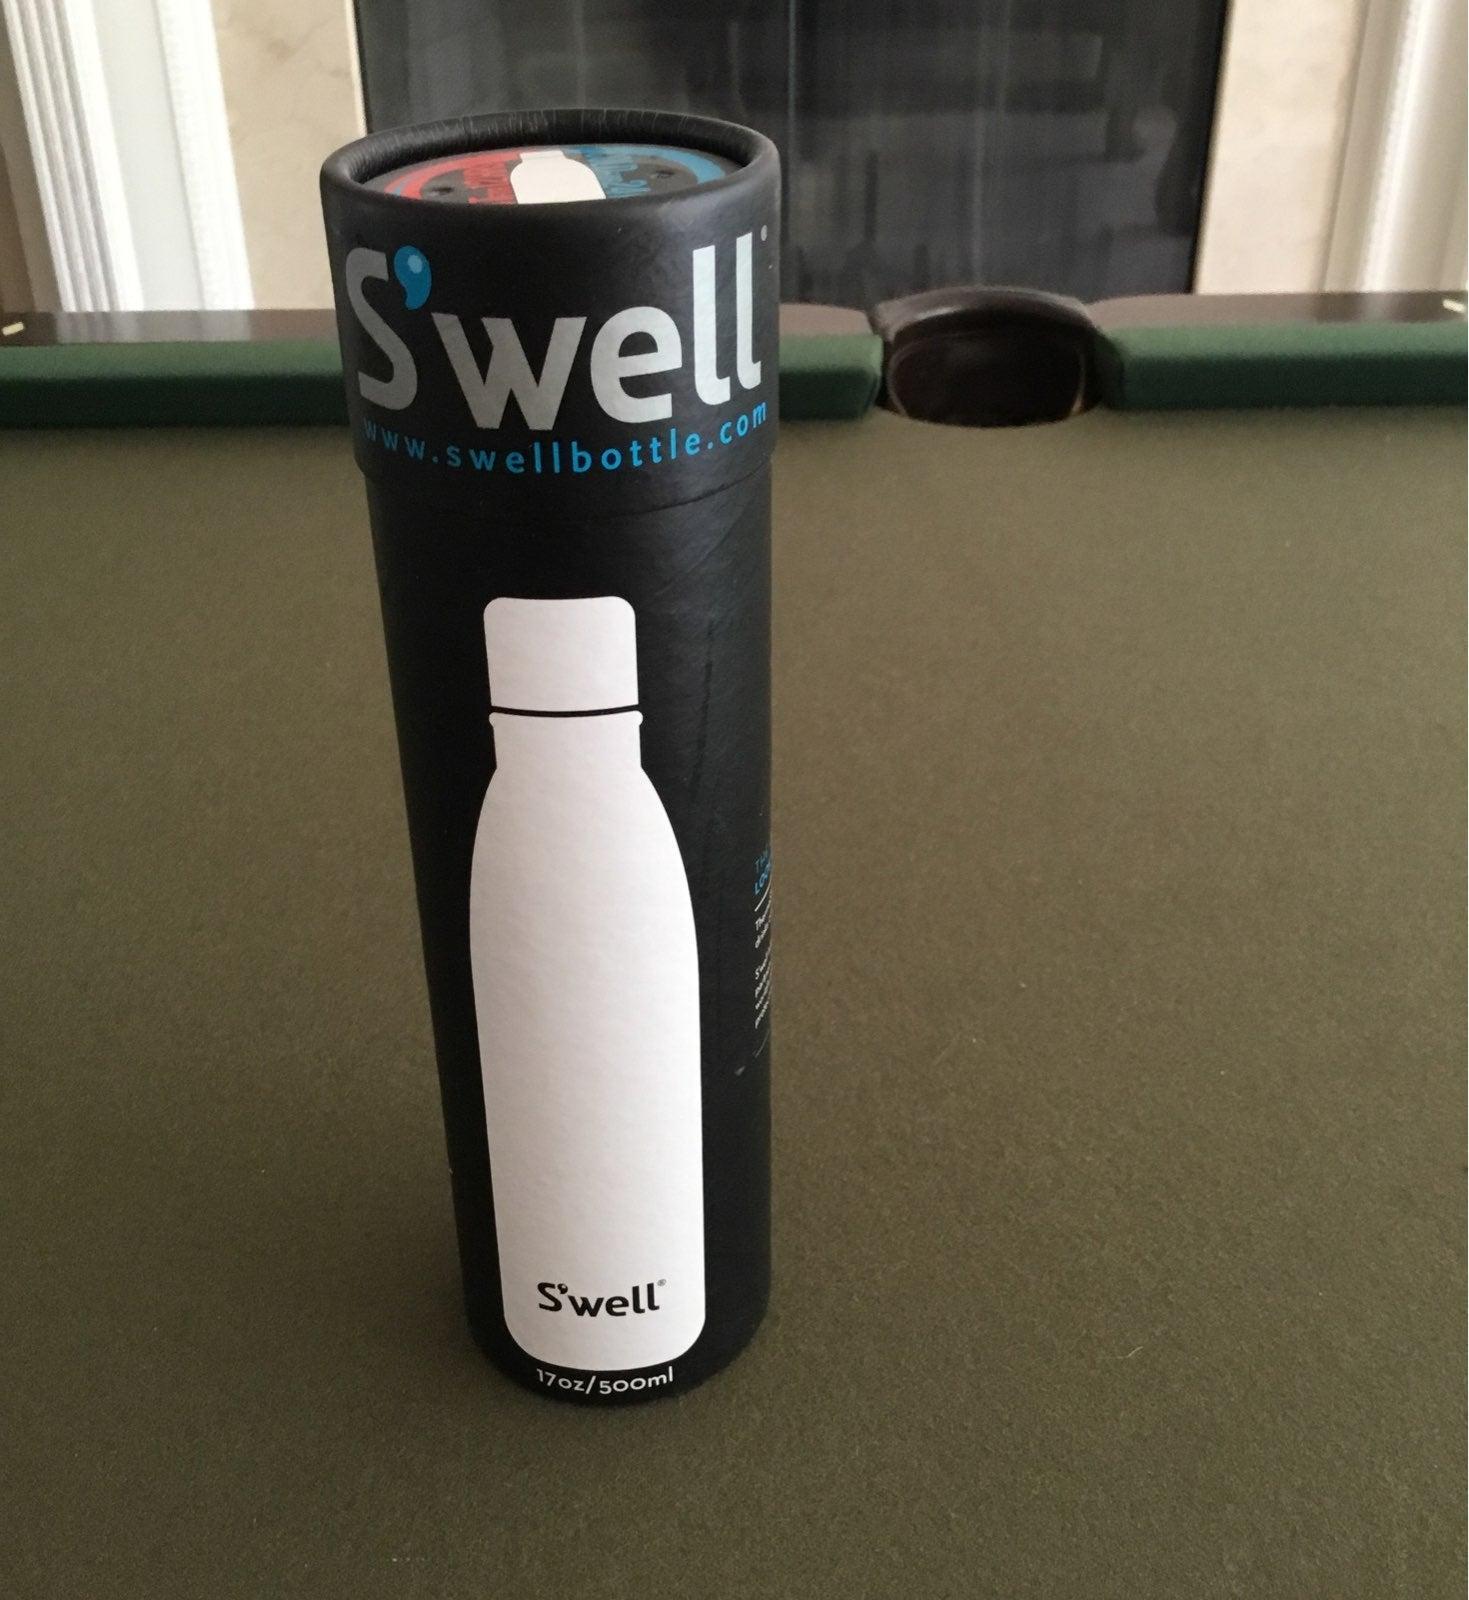 NIB Swell budlight water bottle 17oz